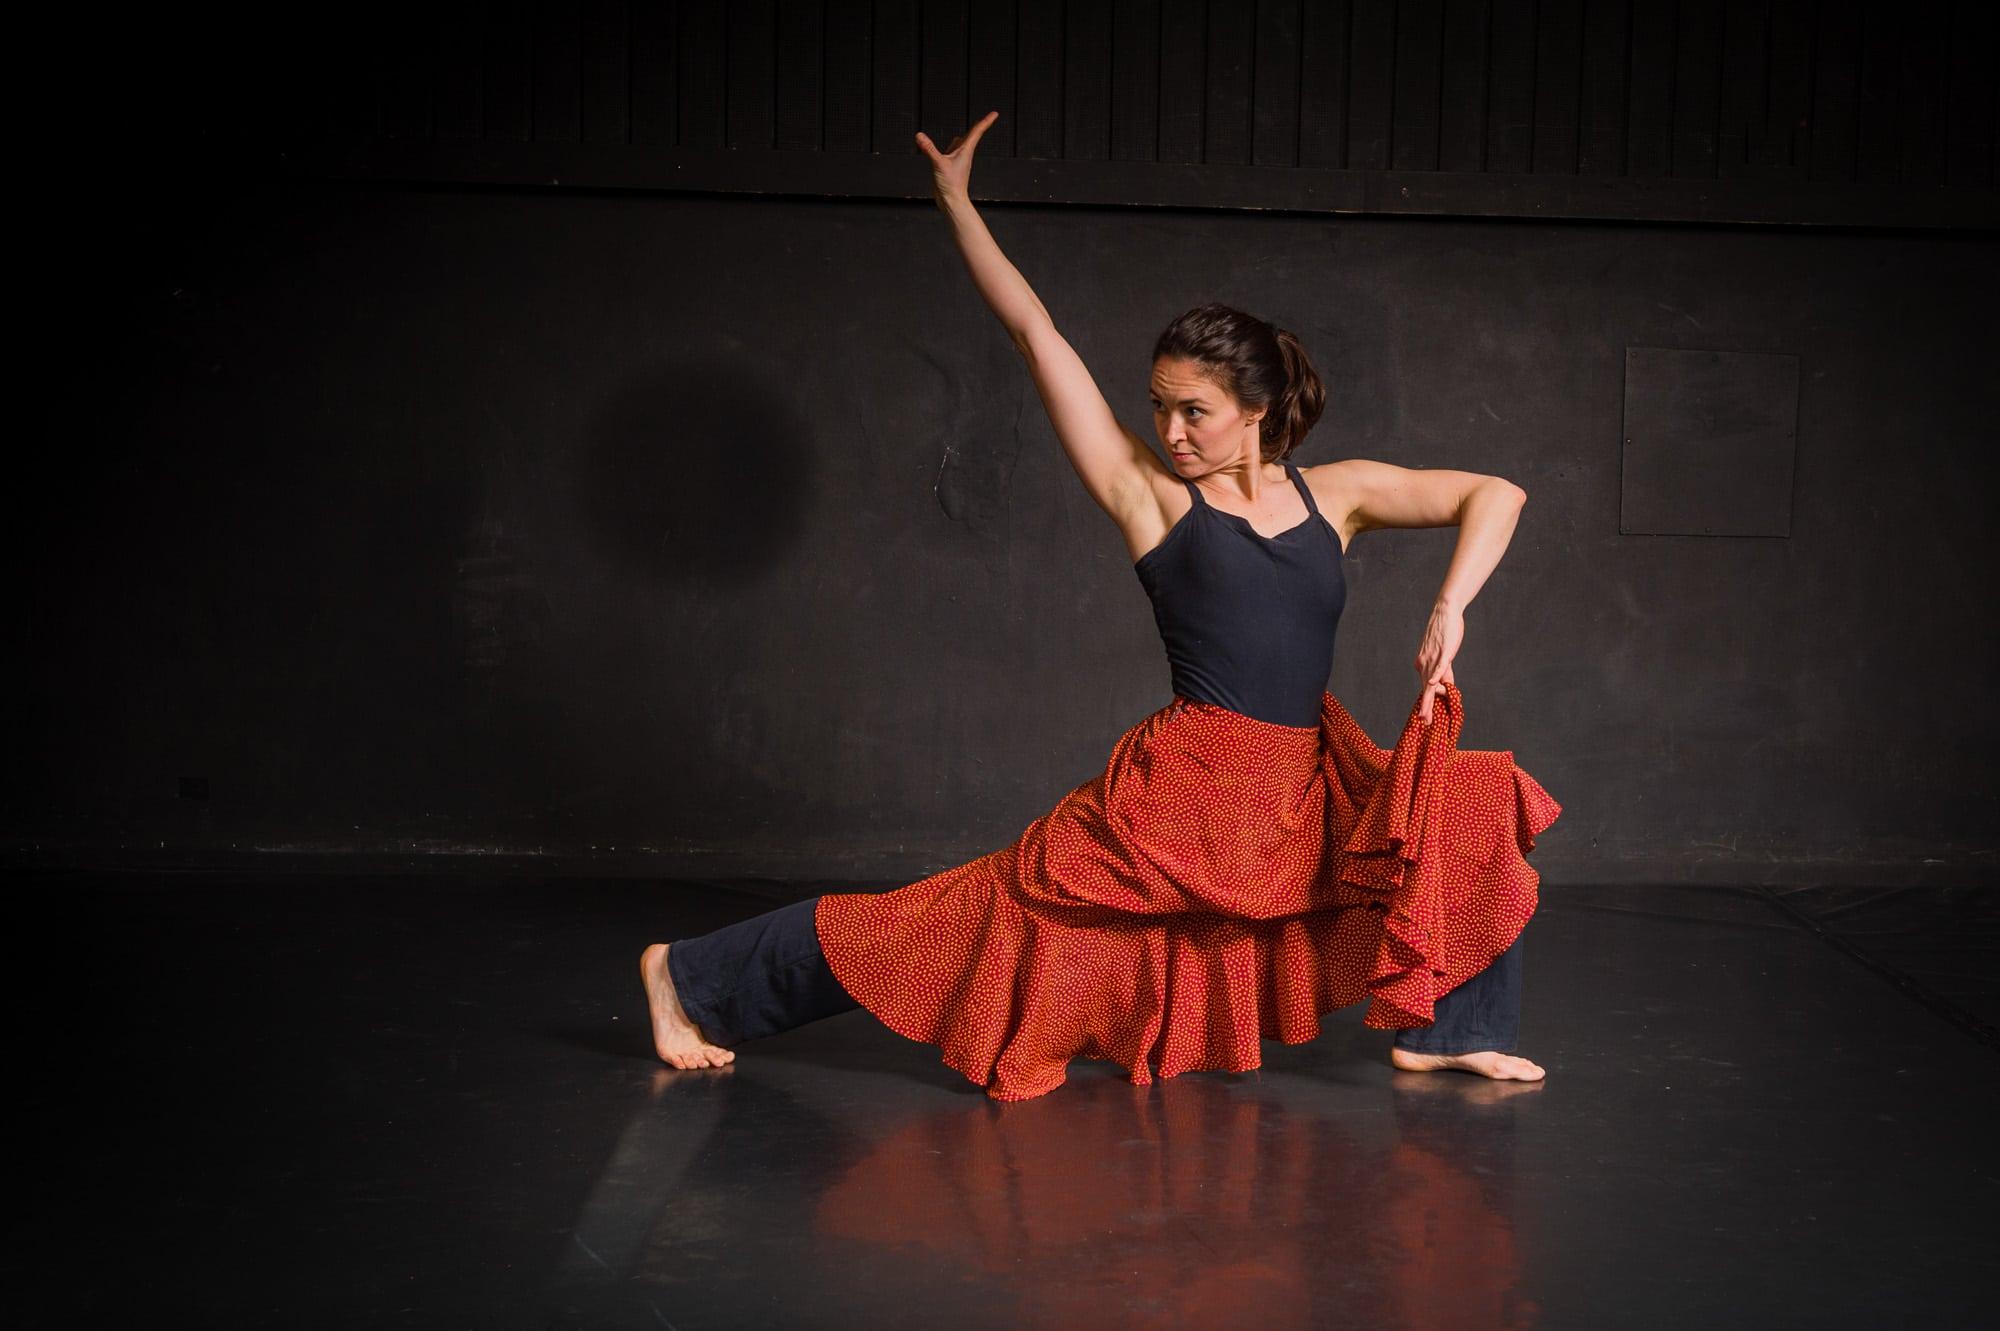 Elen Moos im Tanzstudio, (Foto copyright - Frank Weber - Berlin - fotologbuch.de)